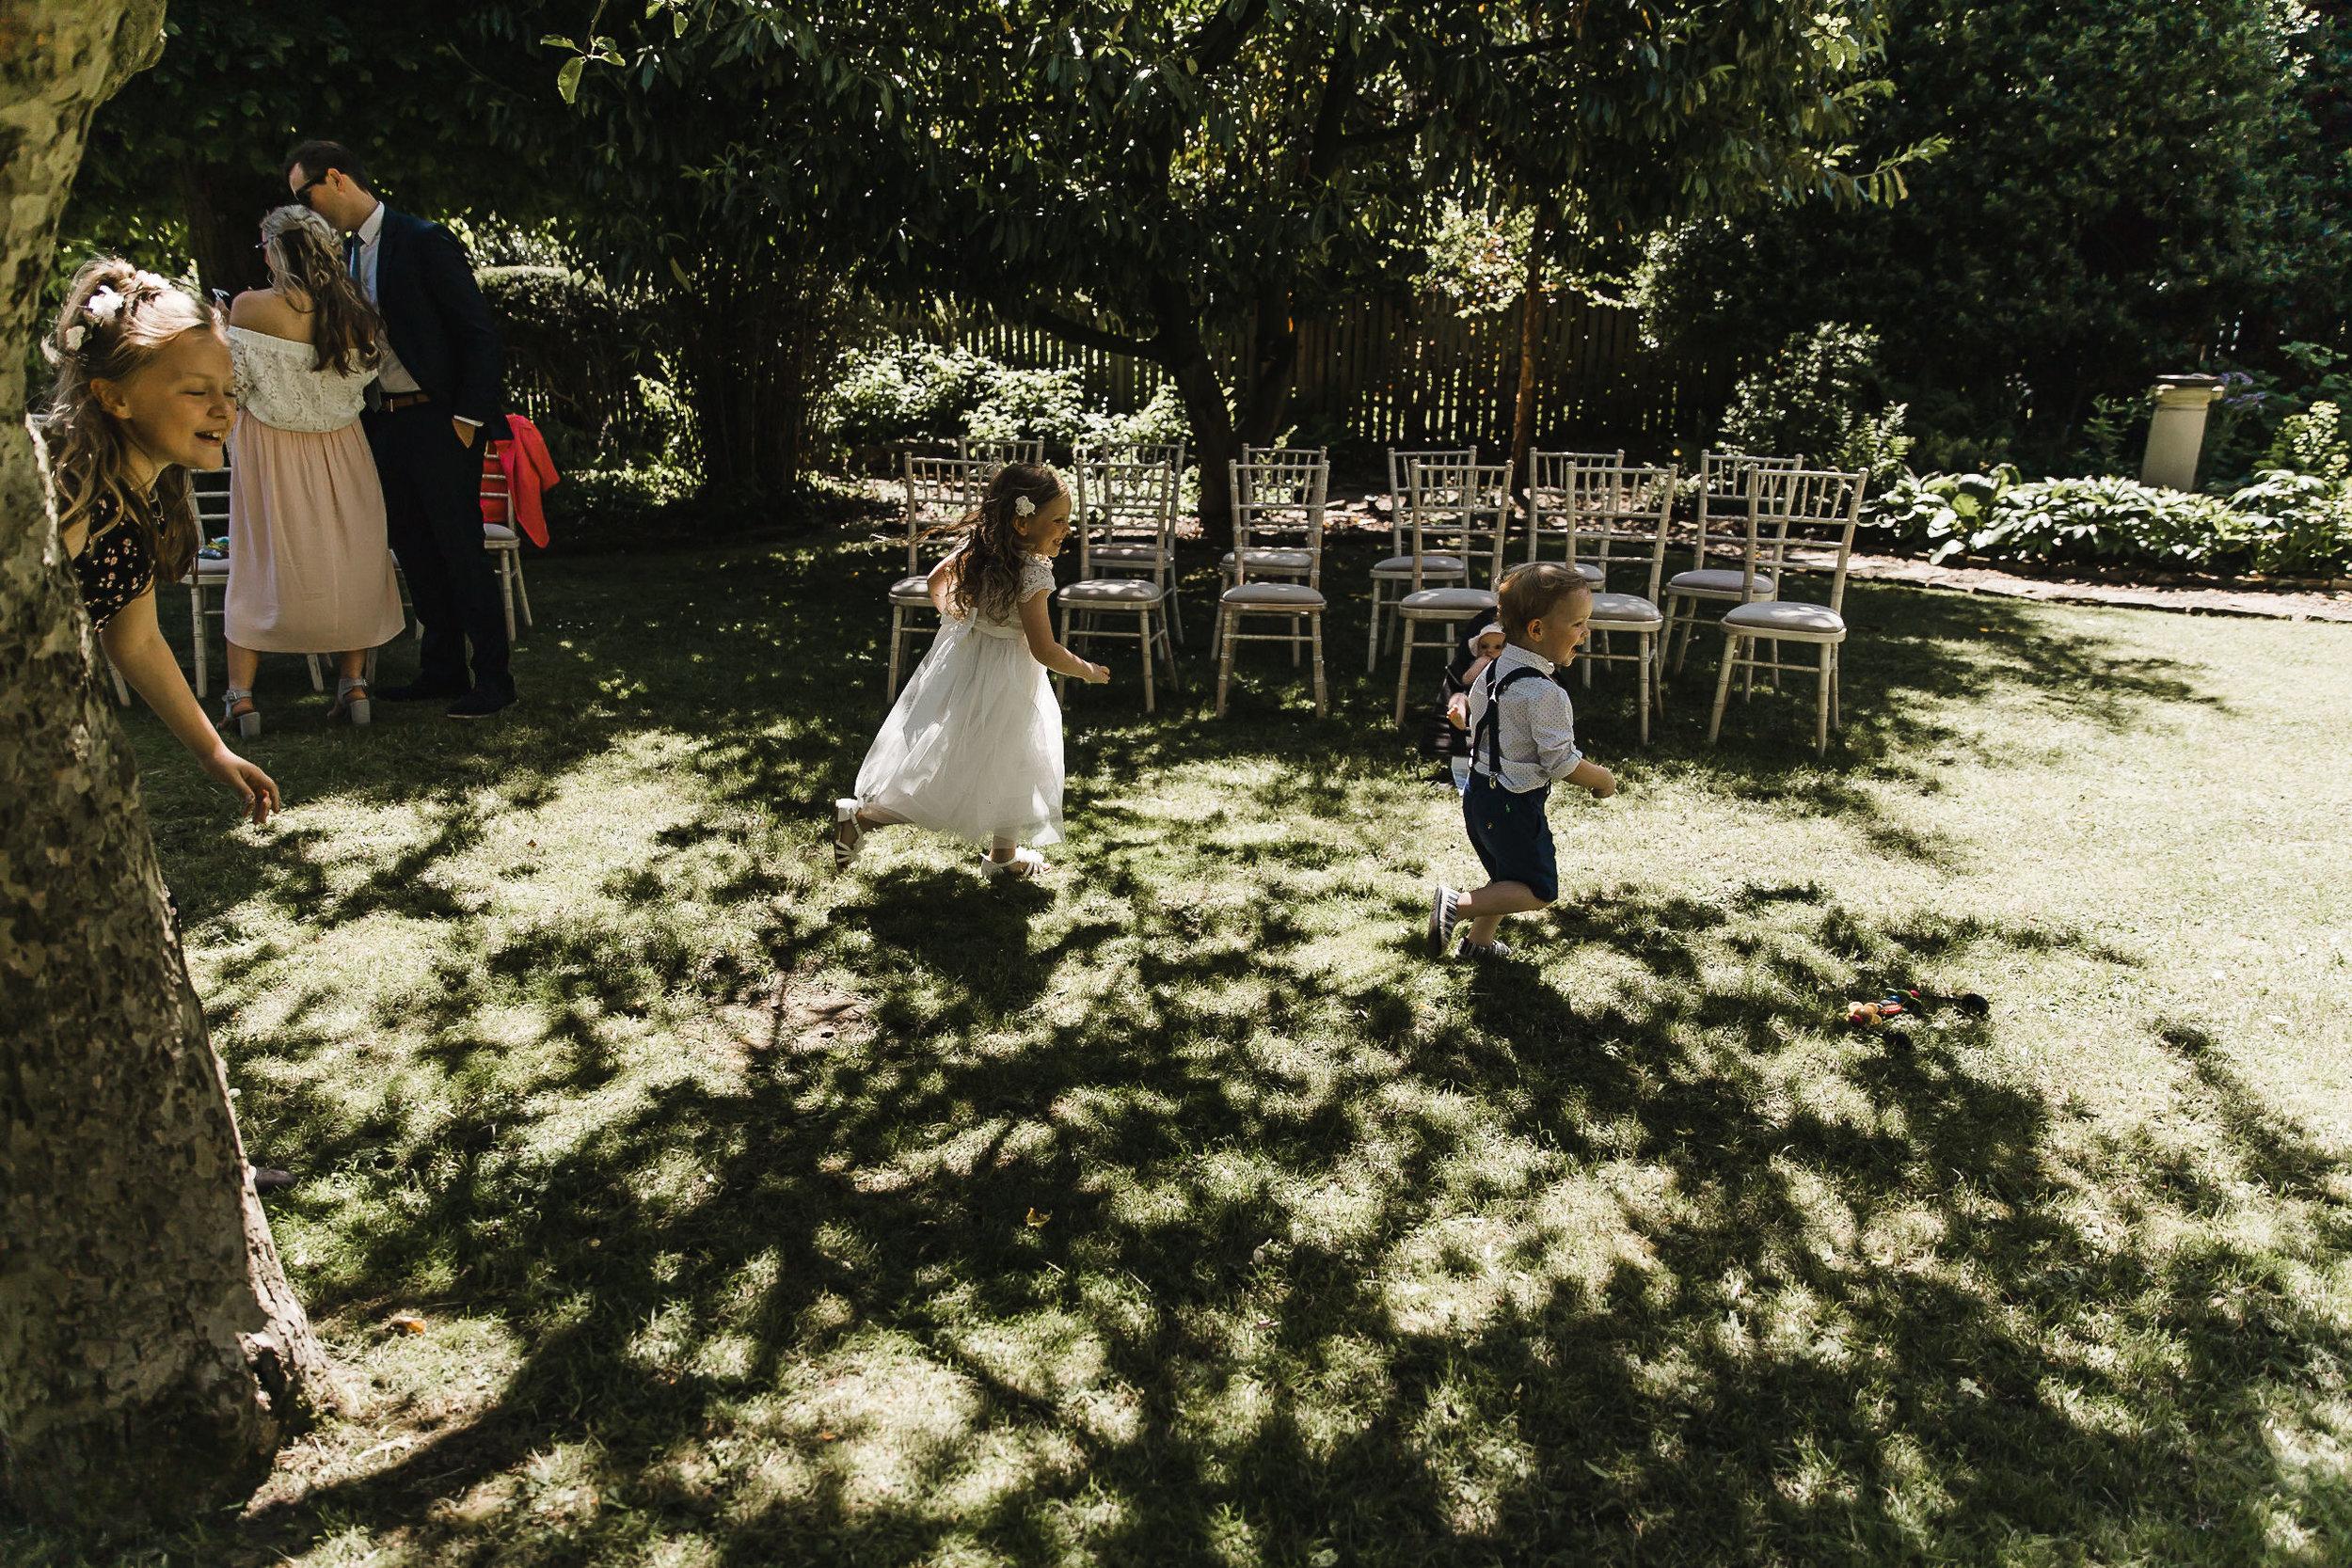 Roundhay-Leeds-Backyard-Wedding-Becs-Chris-070.jpg